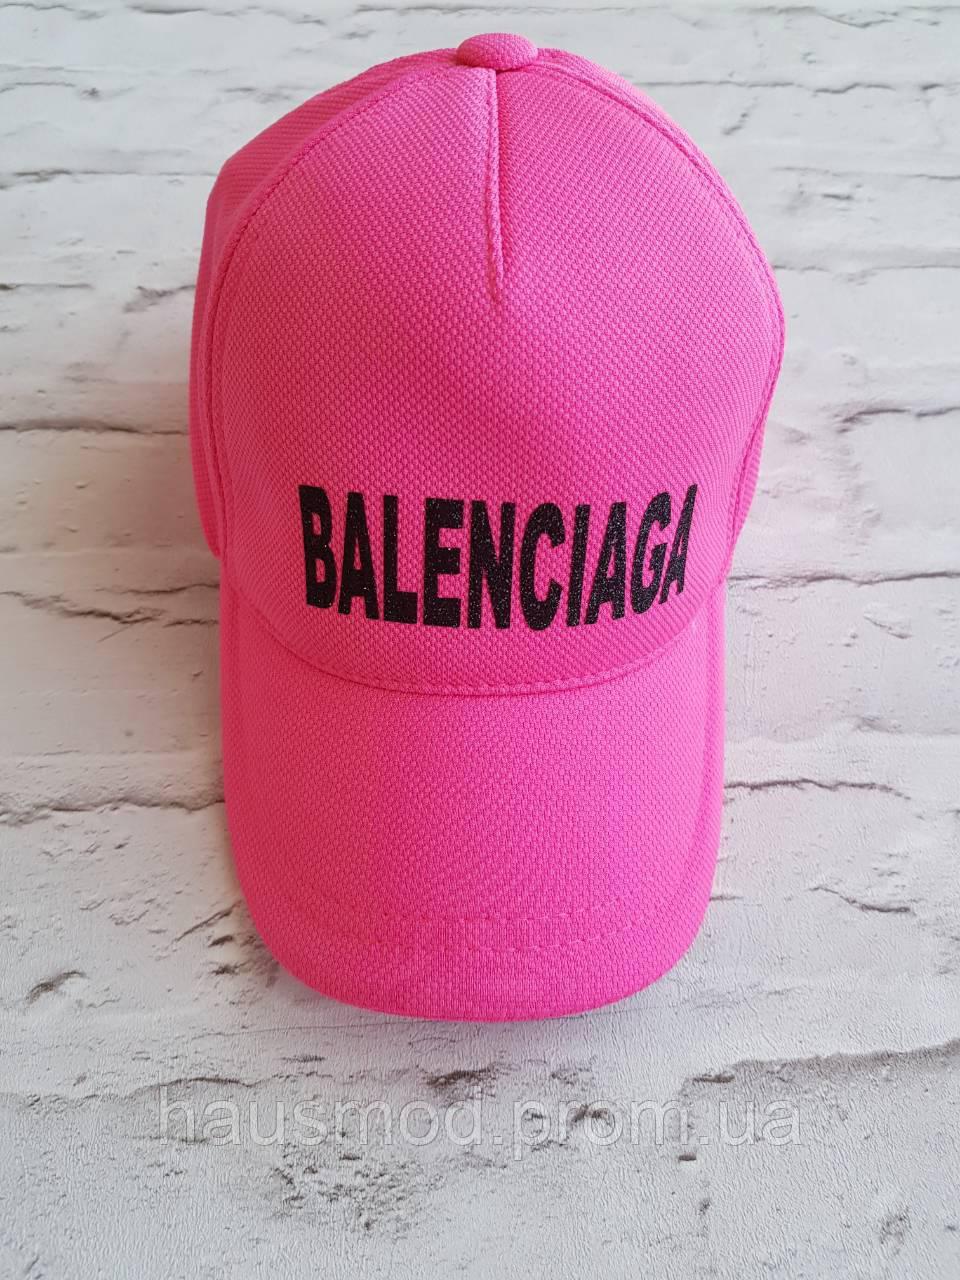 Хит сезона!  новинка женская кепка BALENCIAGA розовая опт и розница со склада в одессе